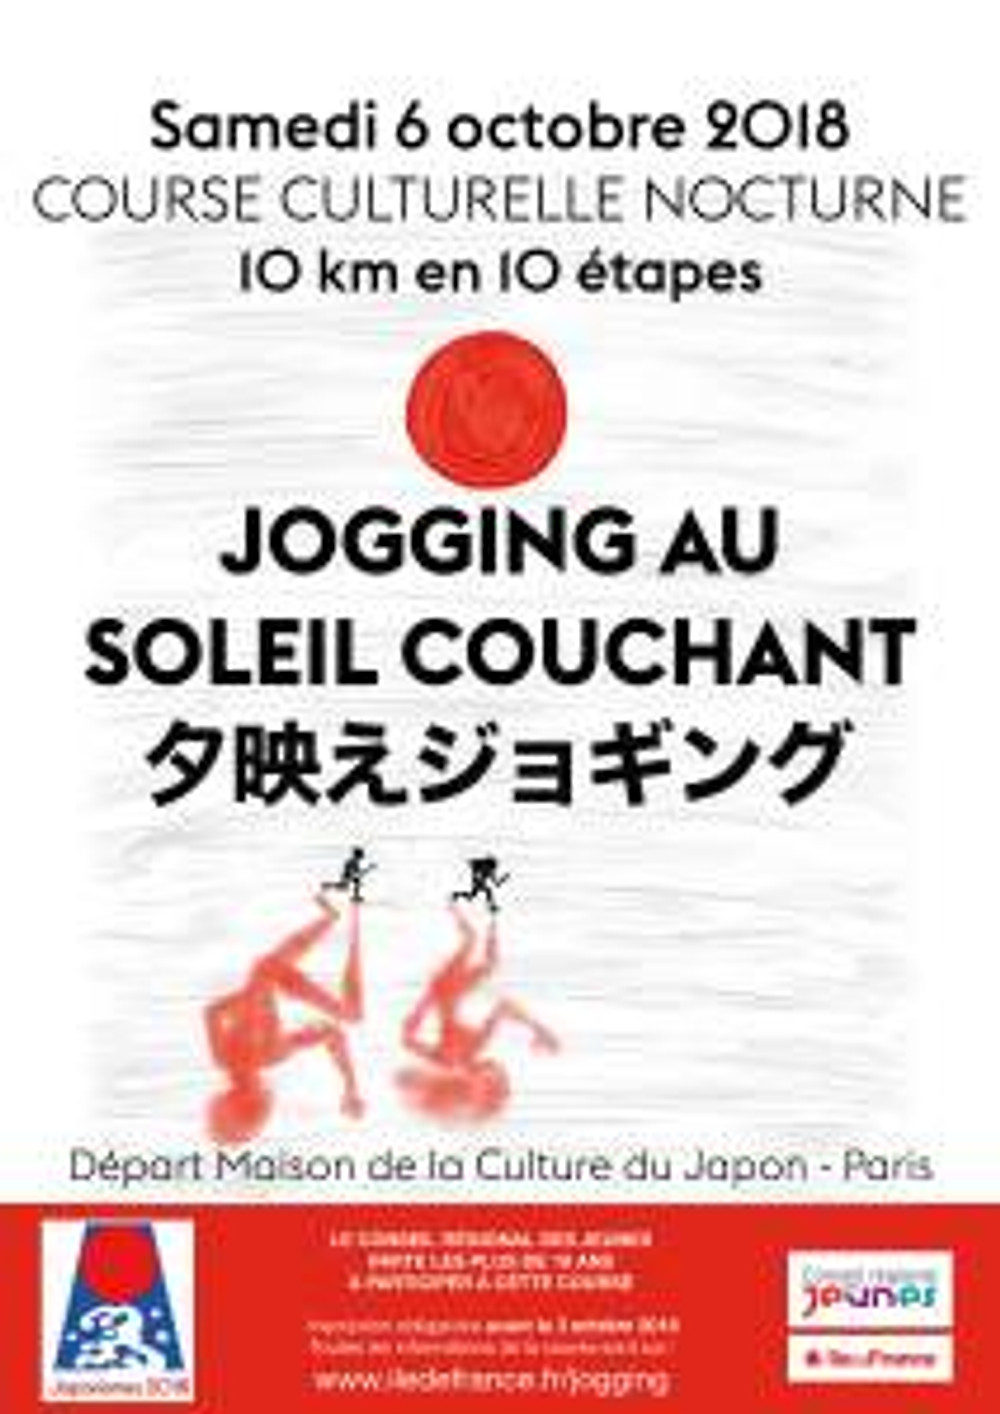 jogging-soleil-couchant-crjidf